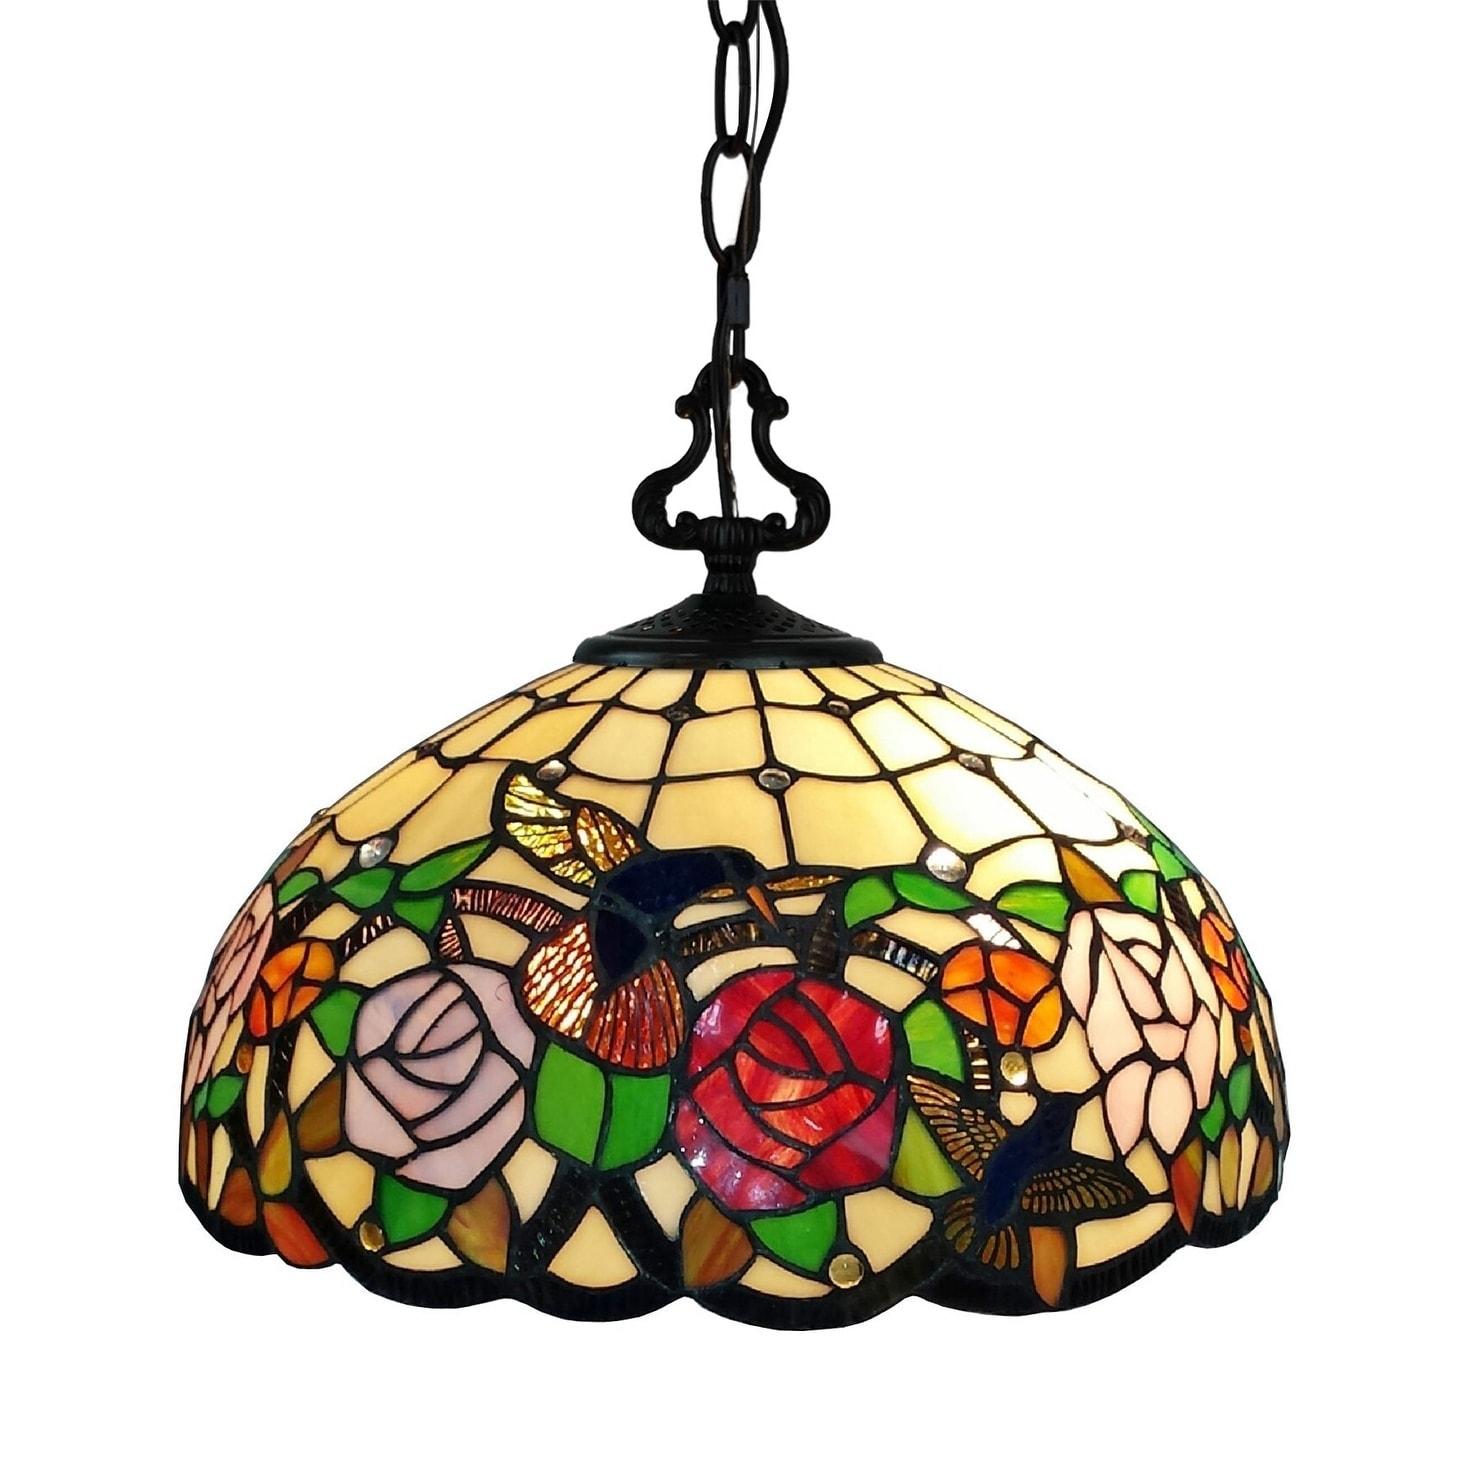 Tiffany Style Hanging Pendant Lamp